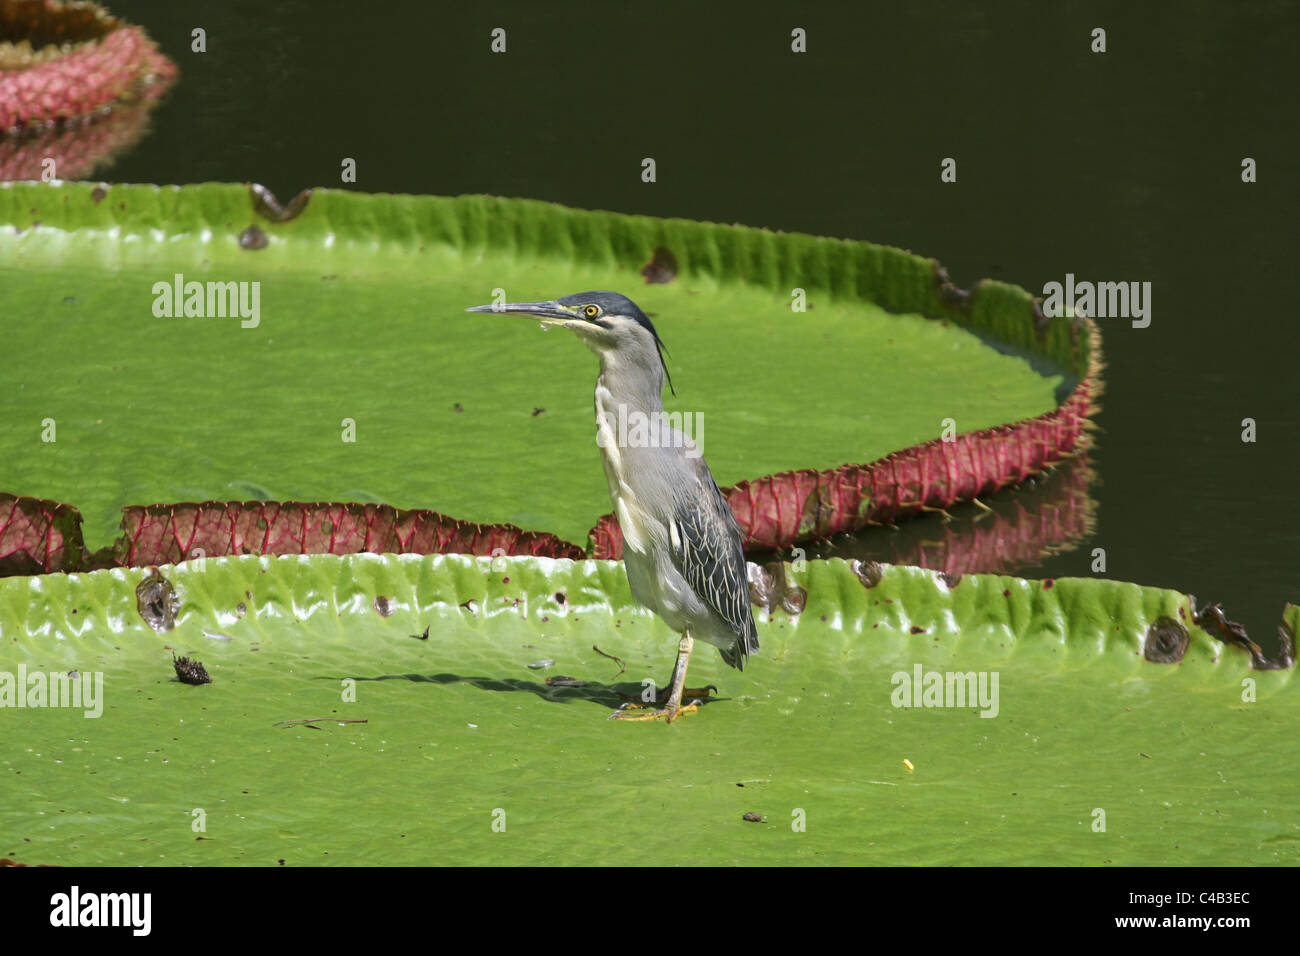 Heron in Mauritius - Stock Image